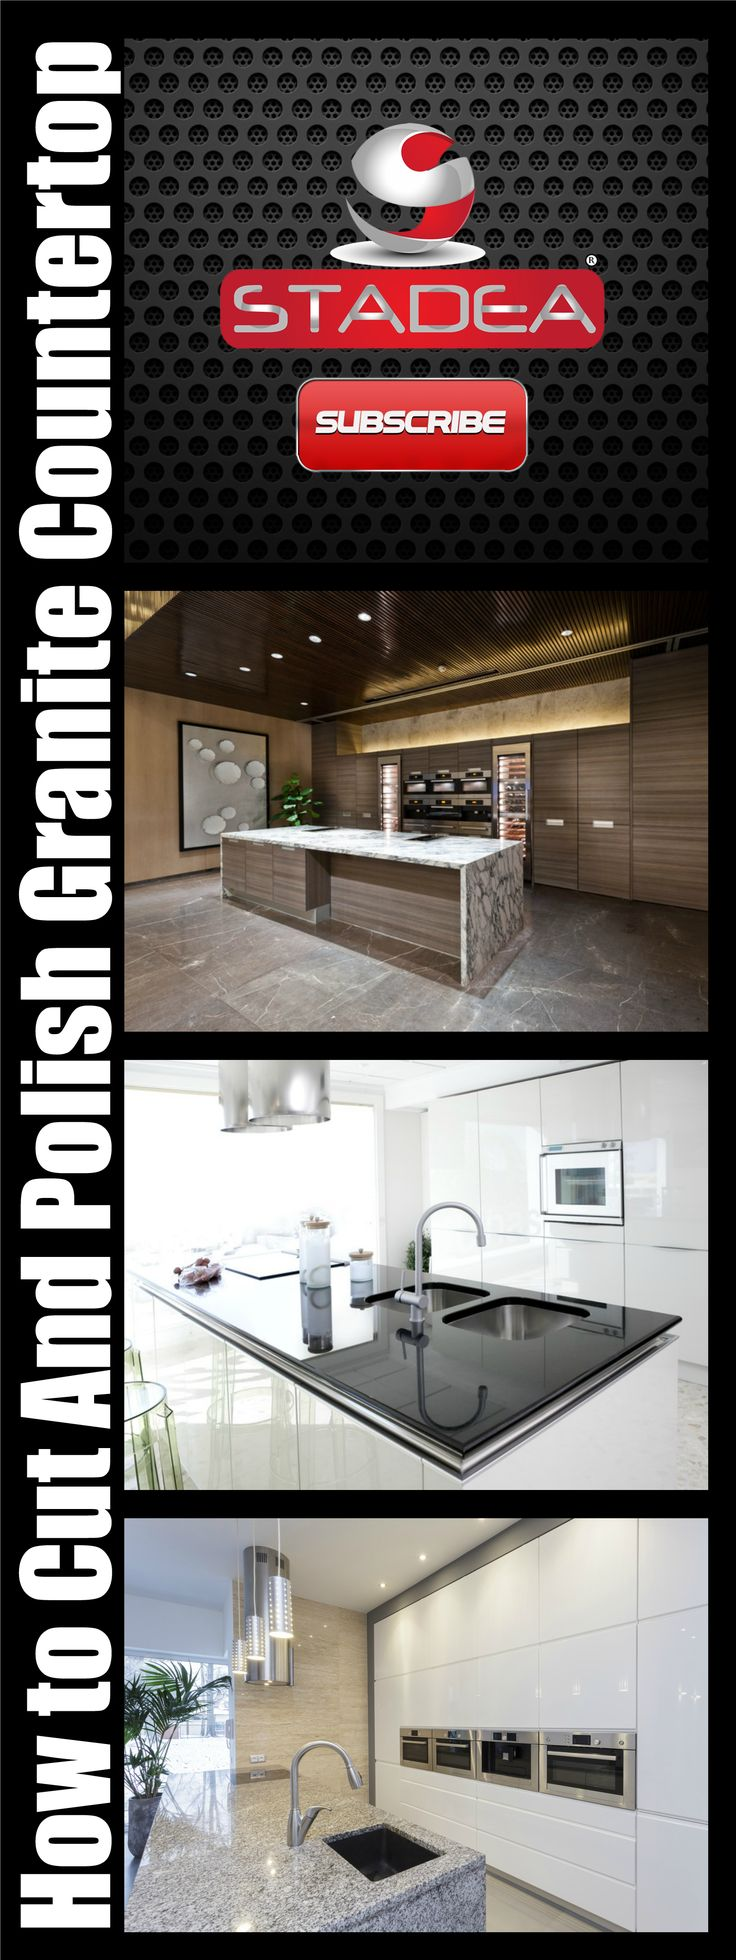 http://www.shopnsavemart.com demonstrates How to Cut And Polish Granite Countertop DIY. Step to step DIY video demonstrates cutting of granite slab using saw blades, polishing the edges using stadea dry diamond polishing pads.